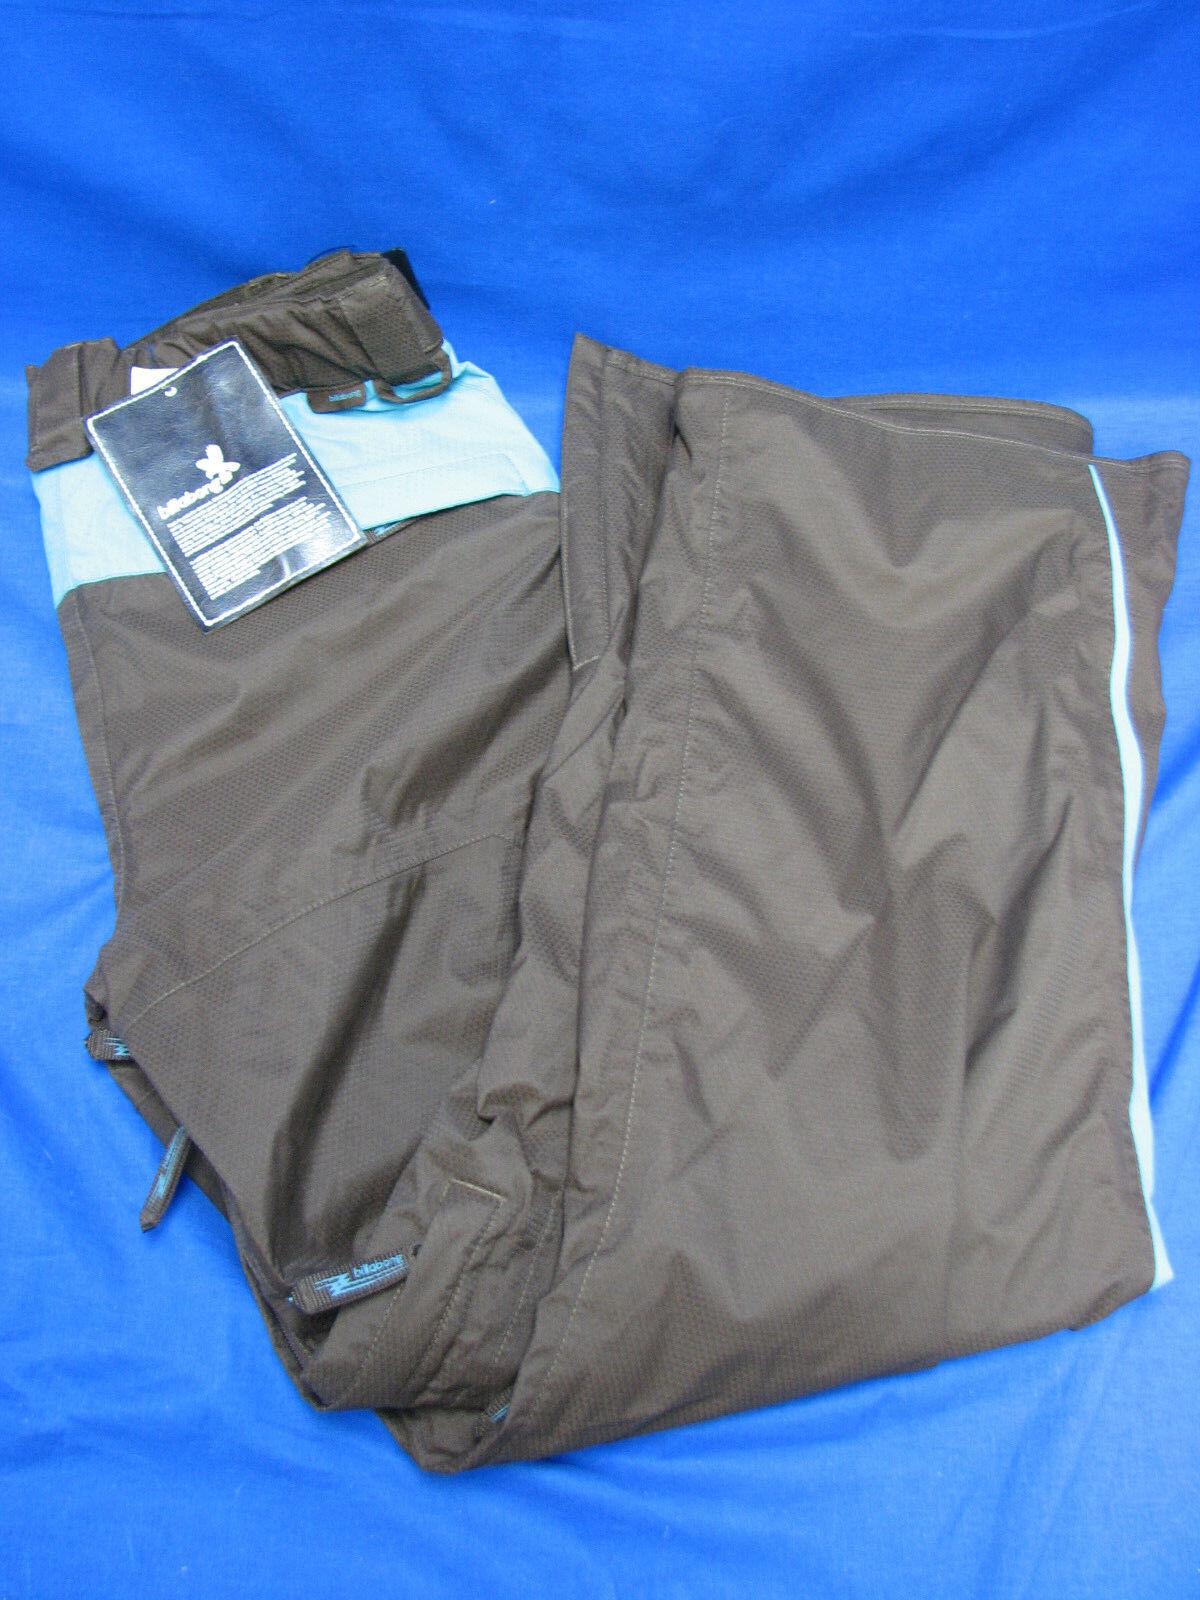 Billabong Women's Snowboard Pants Brown Turquoise Large MSRP